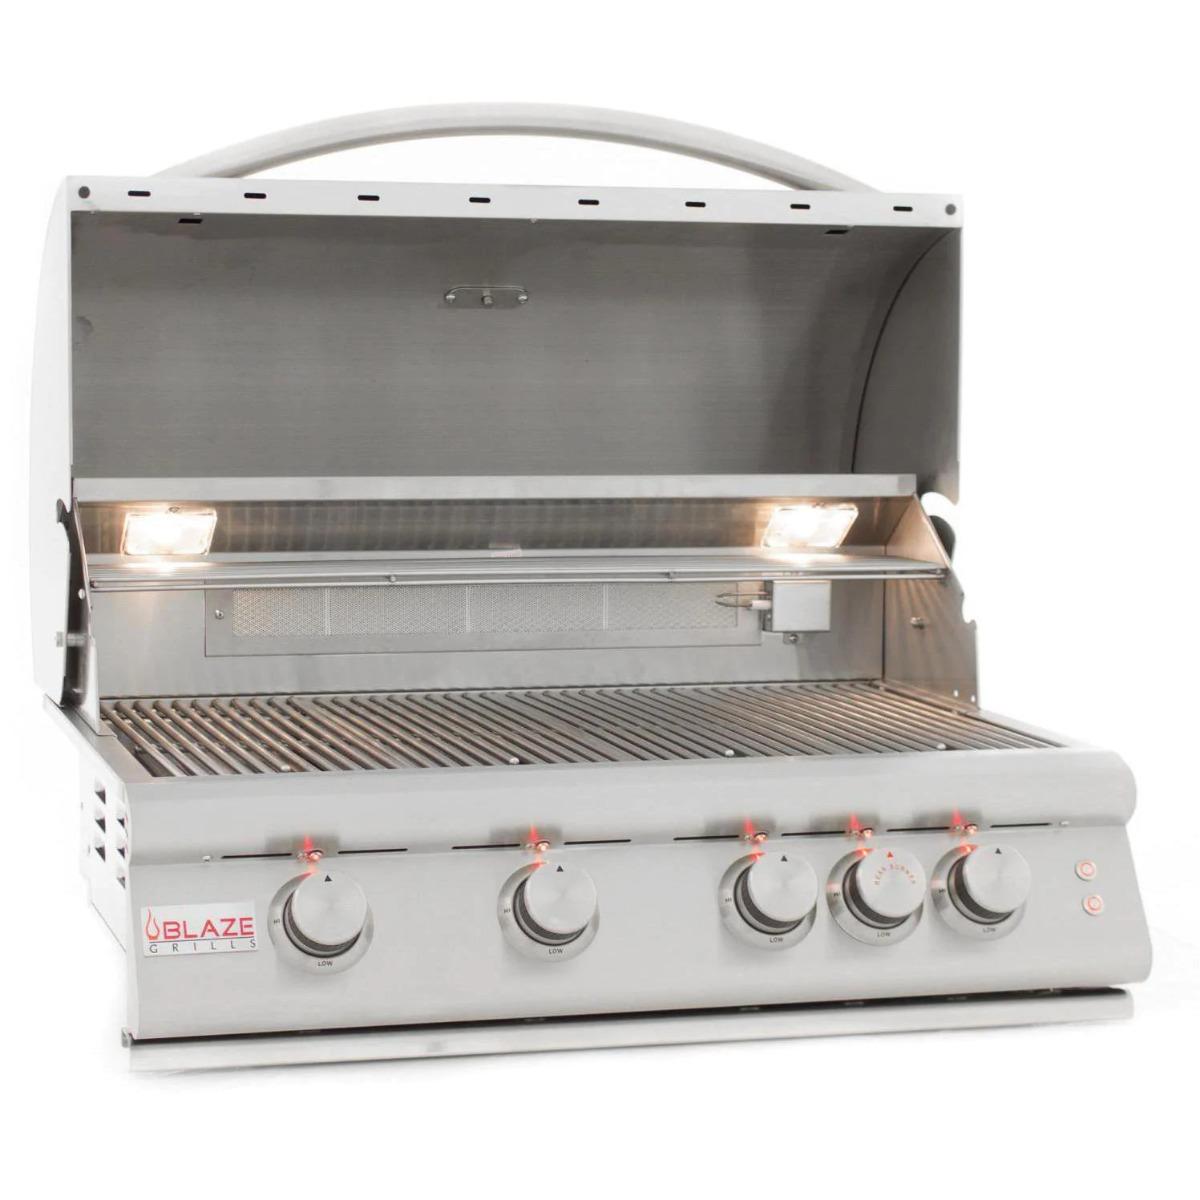 Blaze Premium LTE 32-Inch 4-Burner Built-In Natural Gas Grill With Rear Infrared Burner & Grill Lights - blz-4lte2-ng